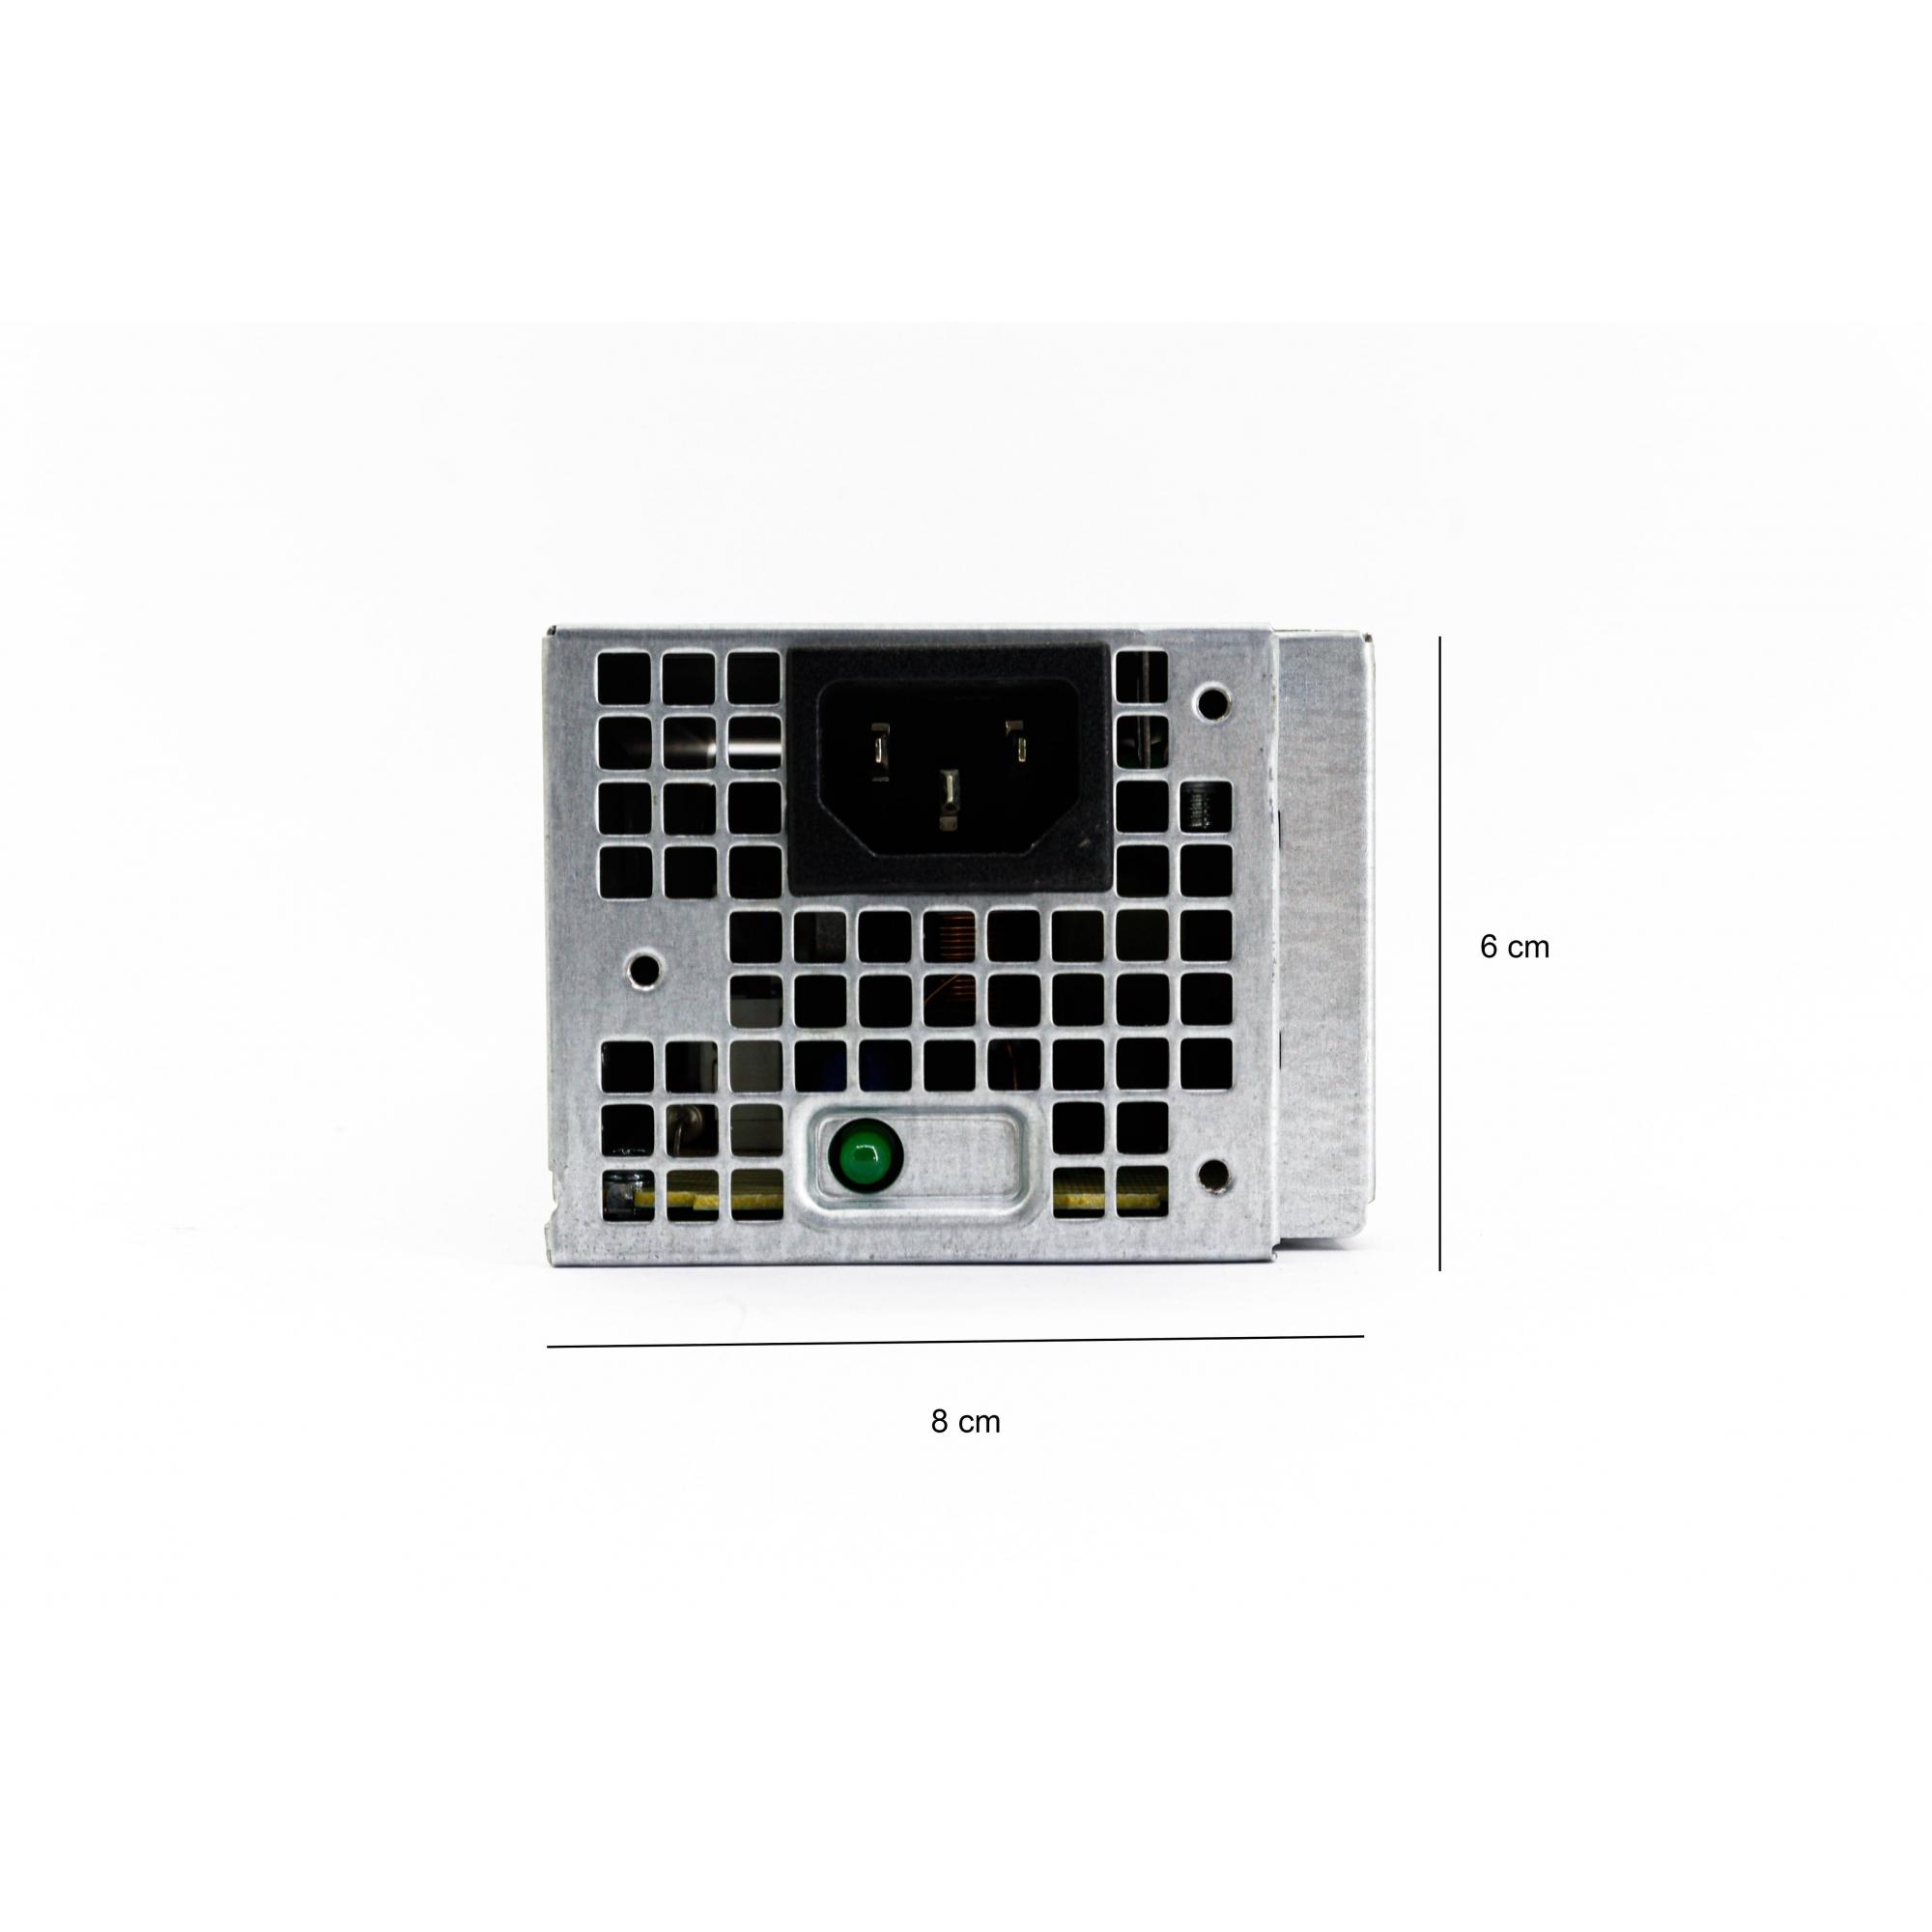 Fonte P/ Dell Inspiron 3268 Optiplex 3050 5050 7050 Vostro 3267 3667 6 pinos P/n N8d59 0YR0FT 02GXHK 0MVDJR 180W +